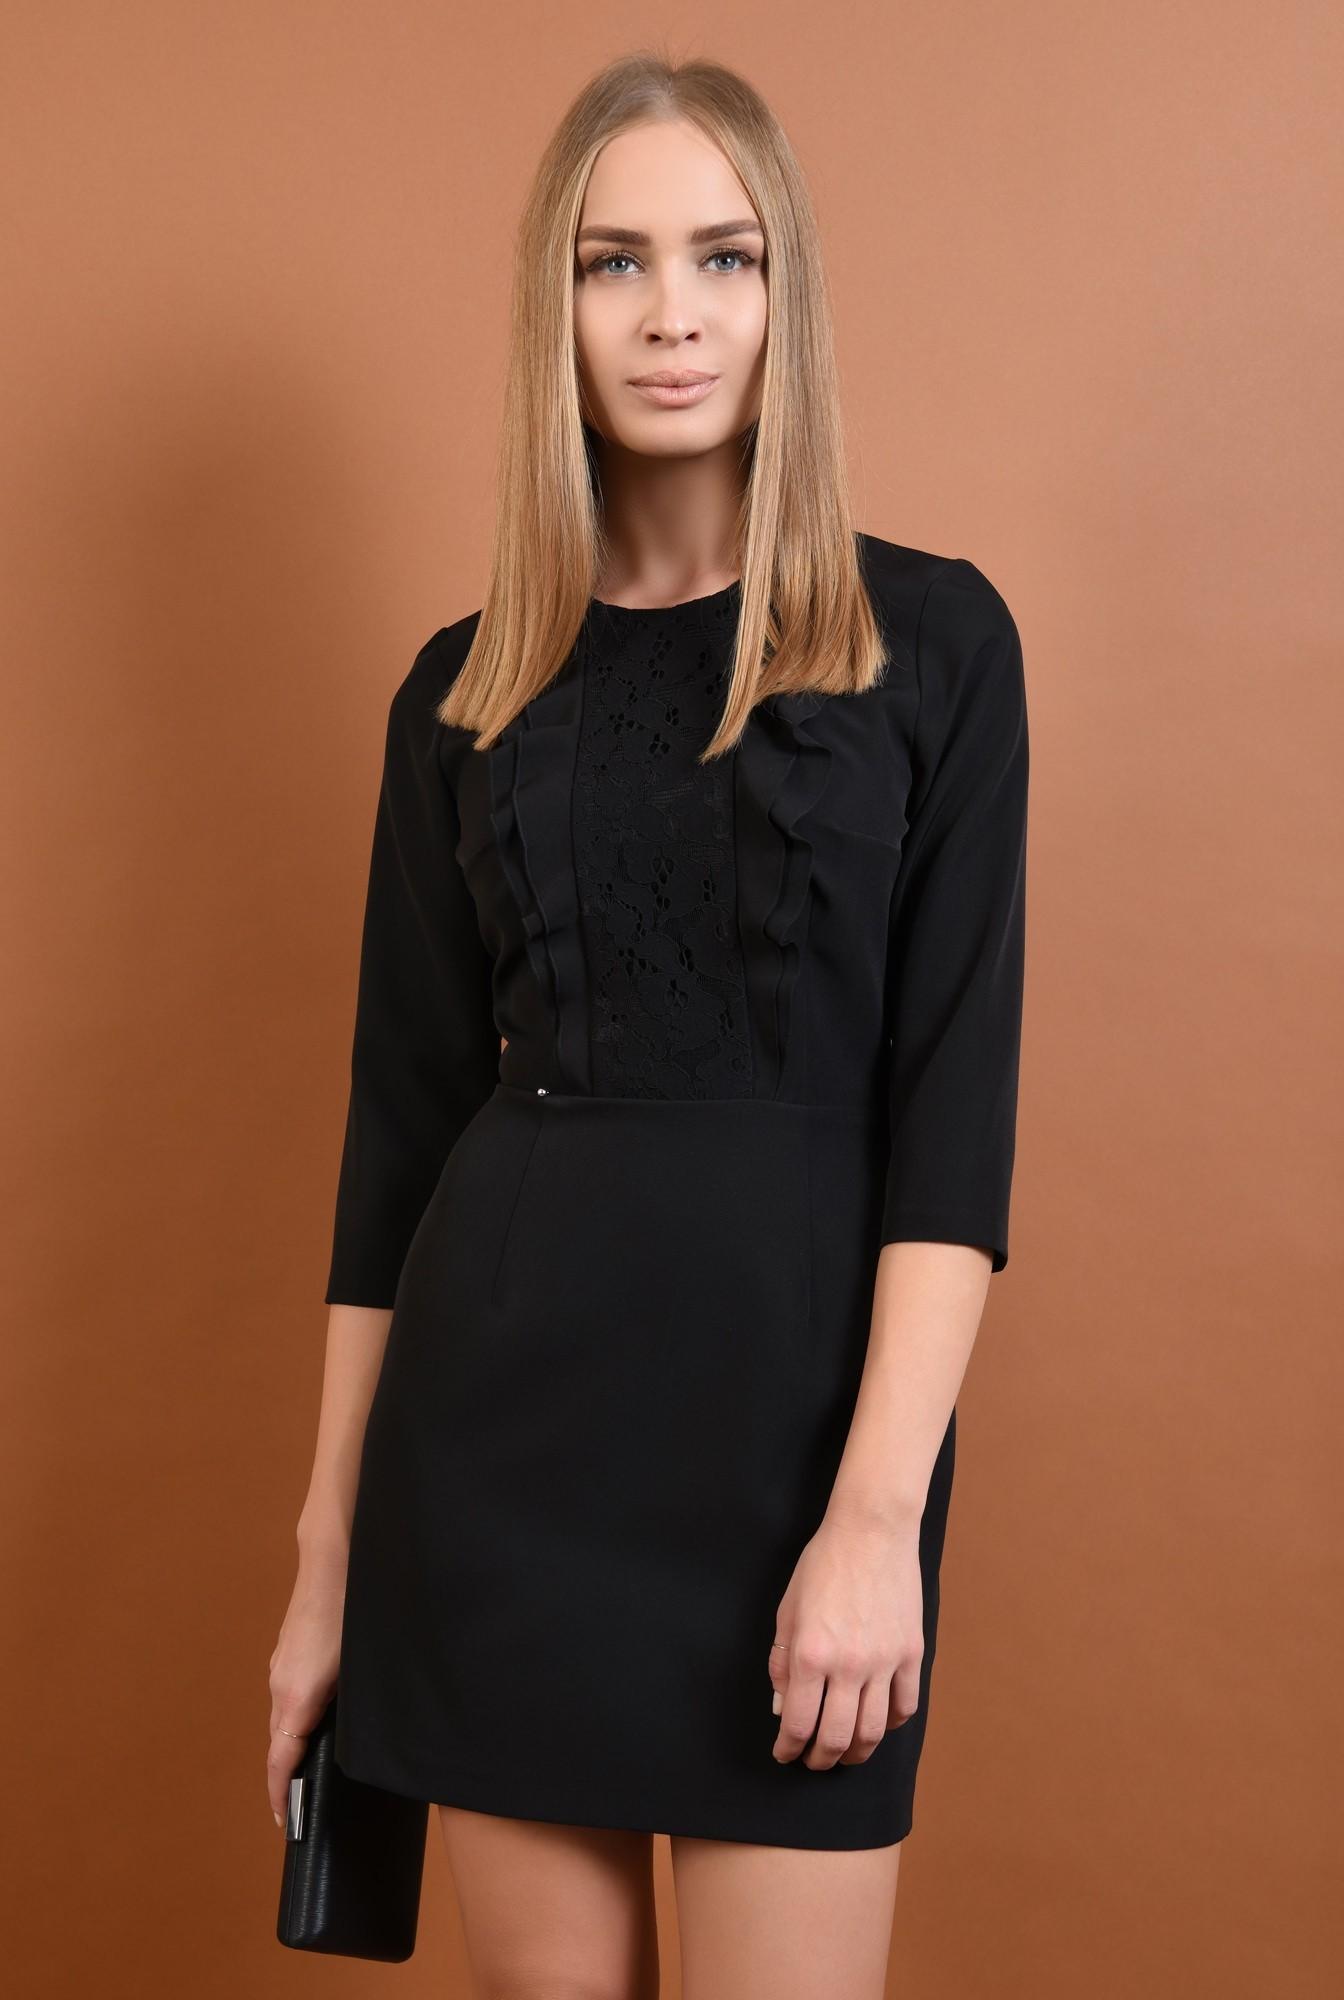 0 - 360 - rochie eleganta, cu volane, dantela aplicata, mini, croi cambrat, rochii online